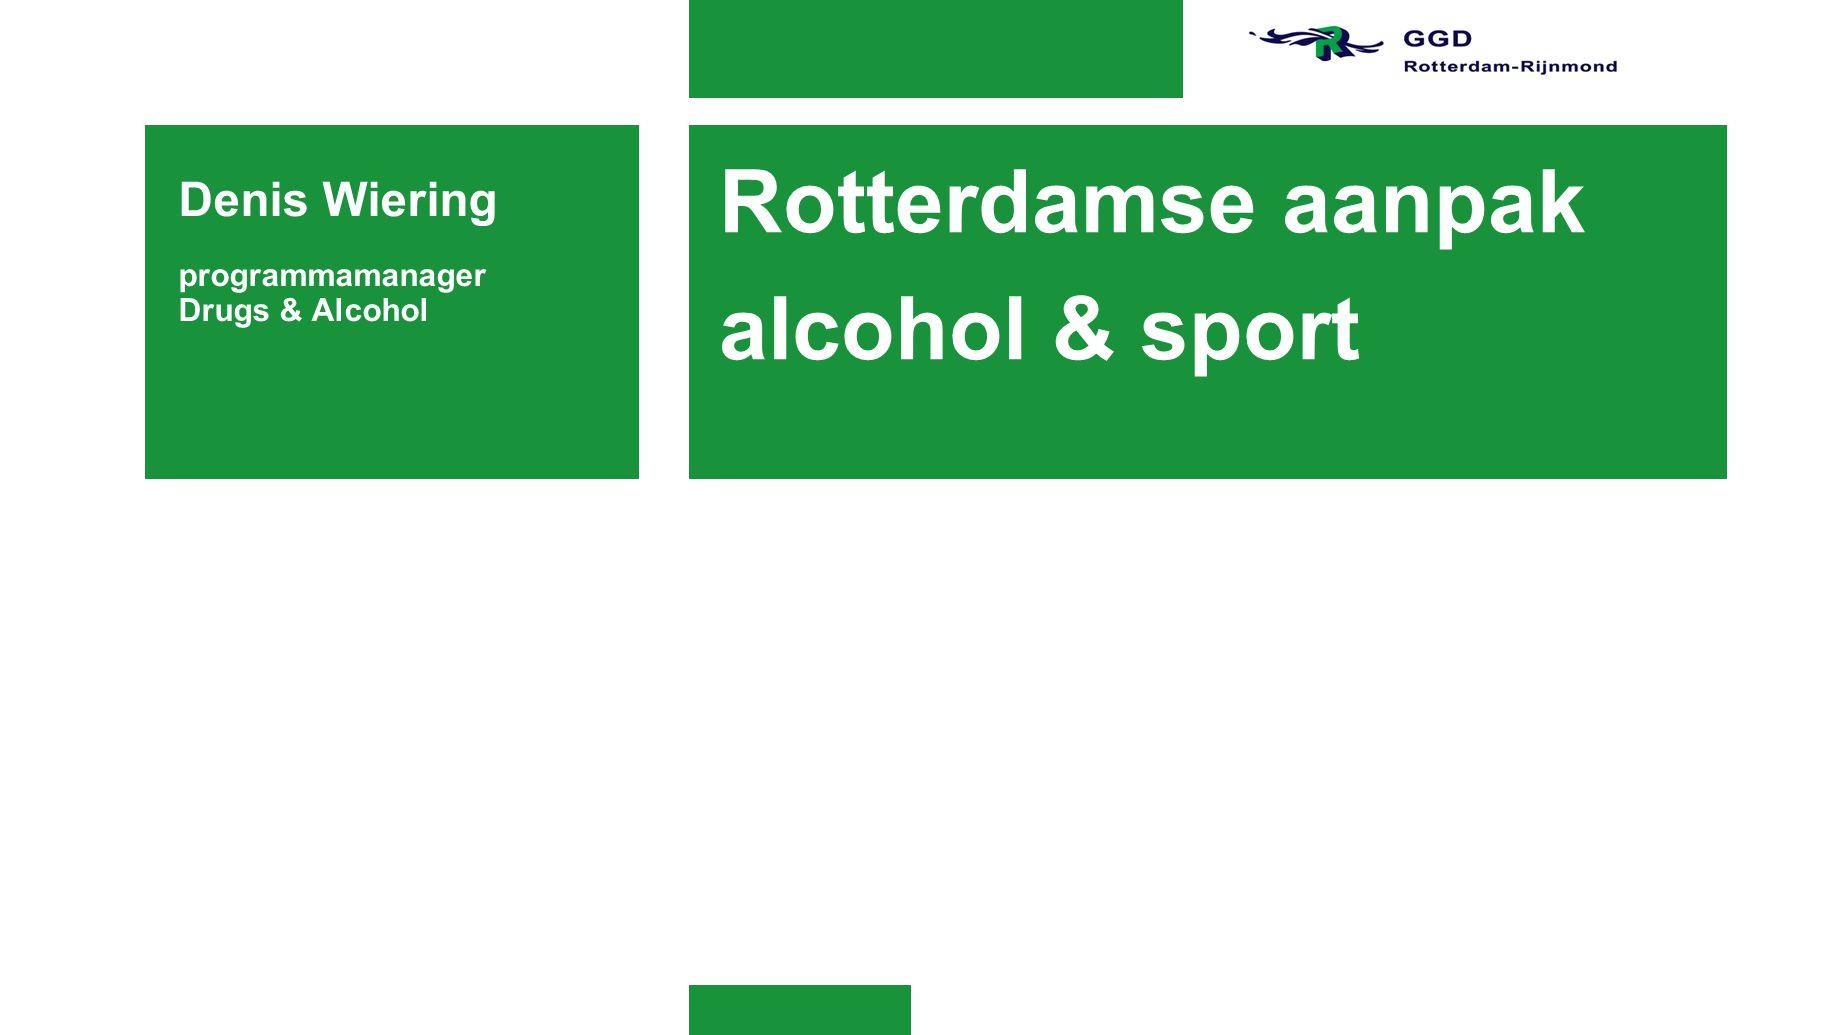 Rotterdamse aanpak alcohol & sport Denis Wiering programmamanager Drugs & Alcohol